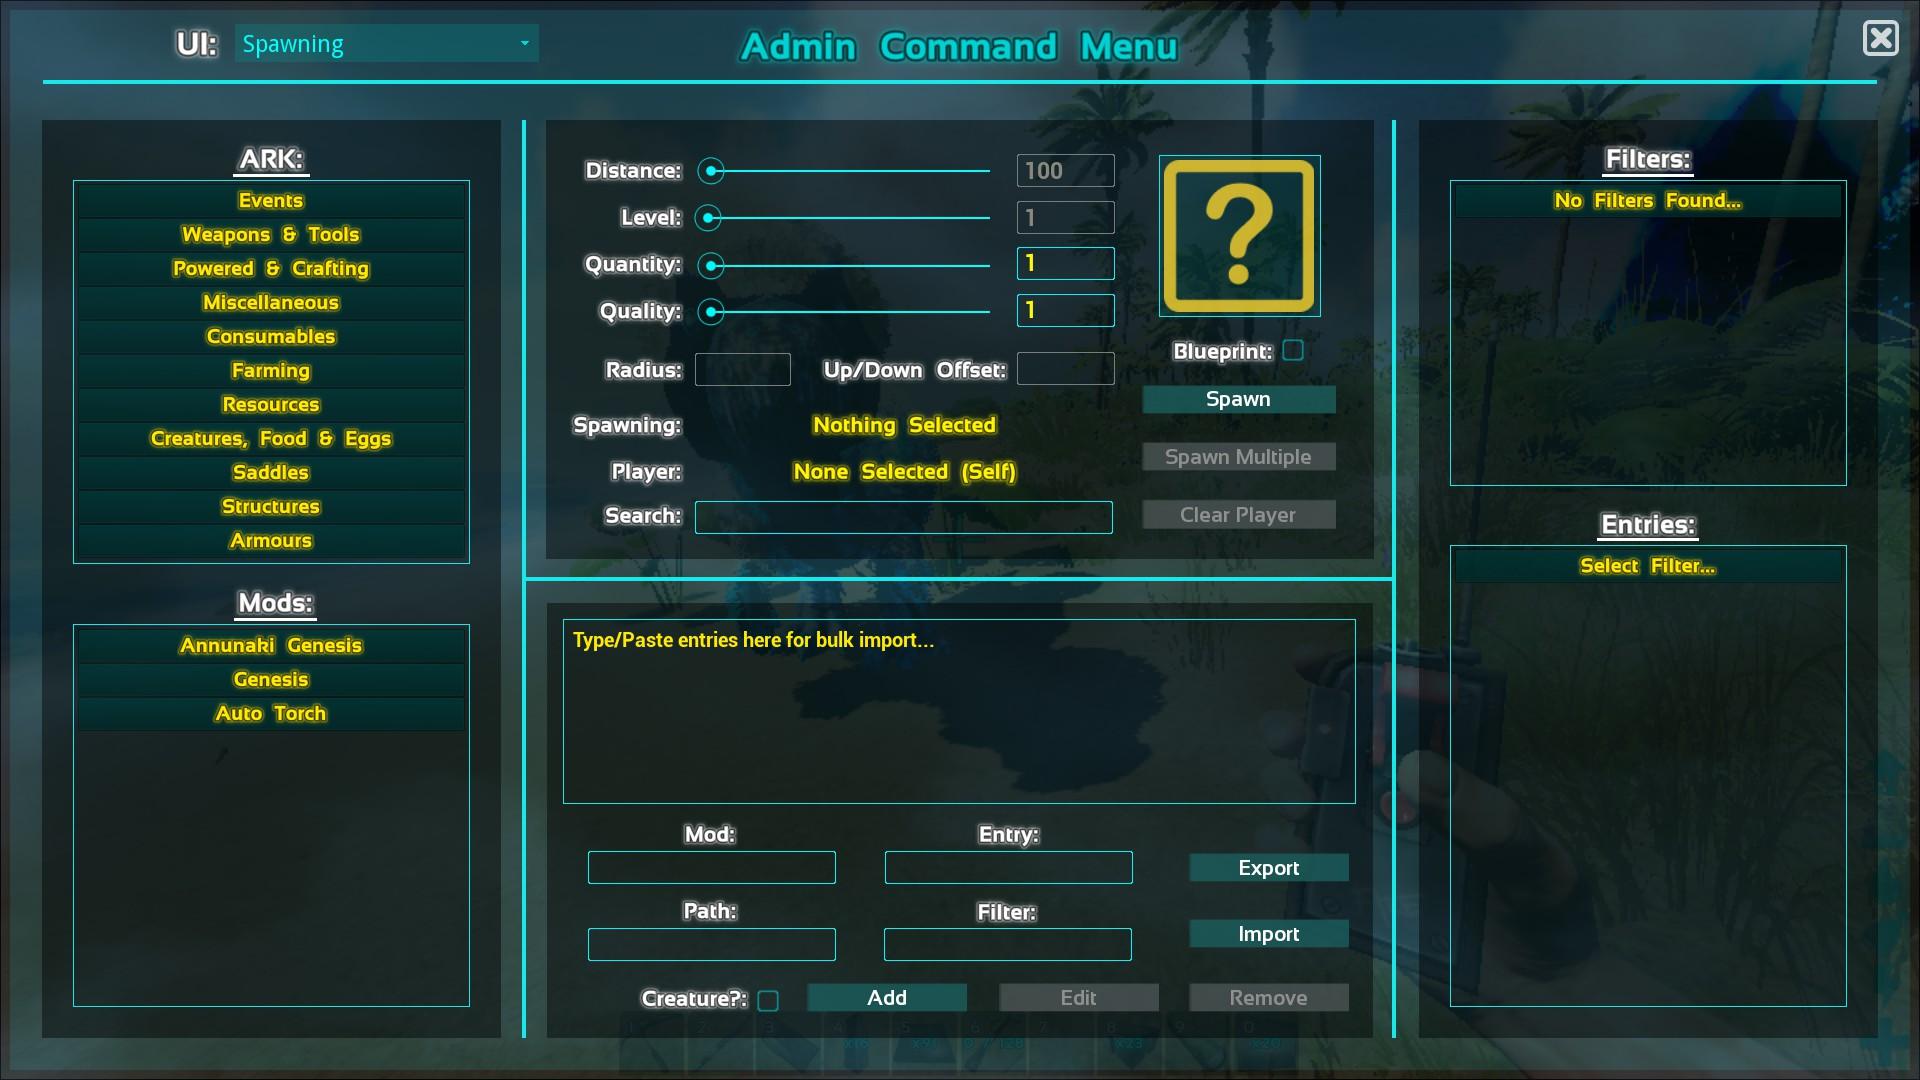 Bulk Import Mods to ARK ACM